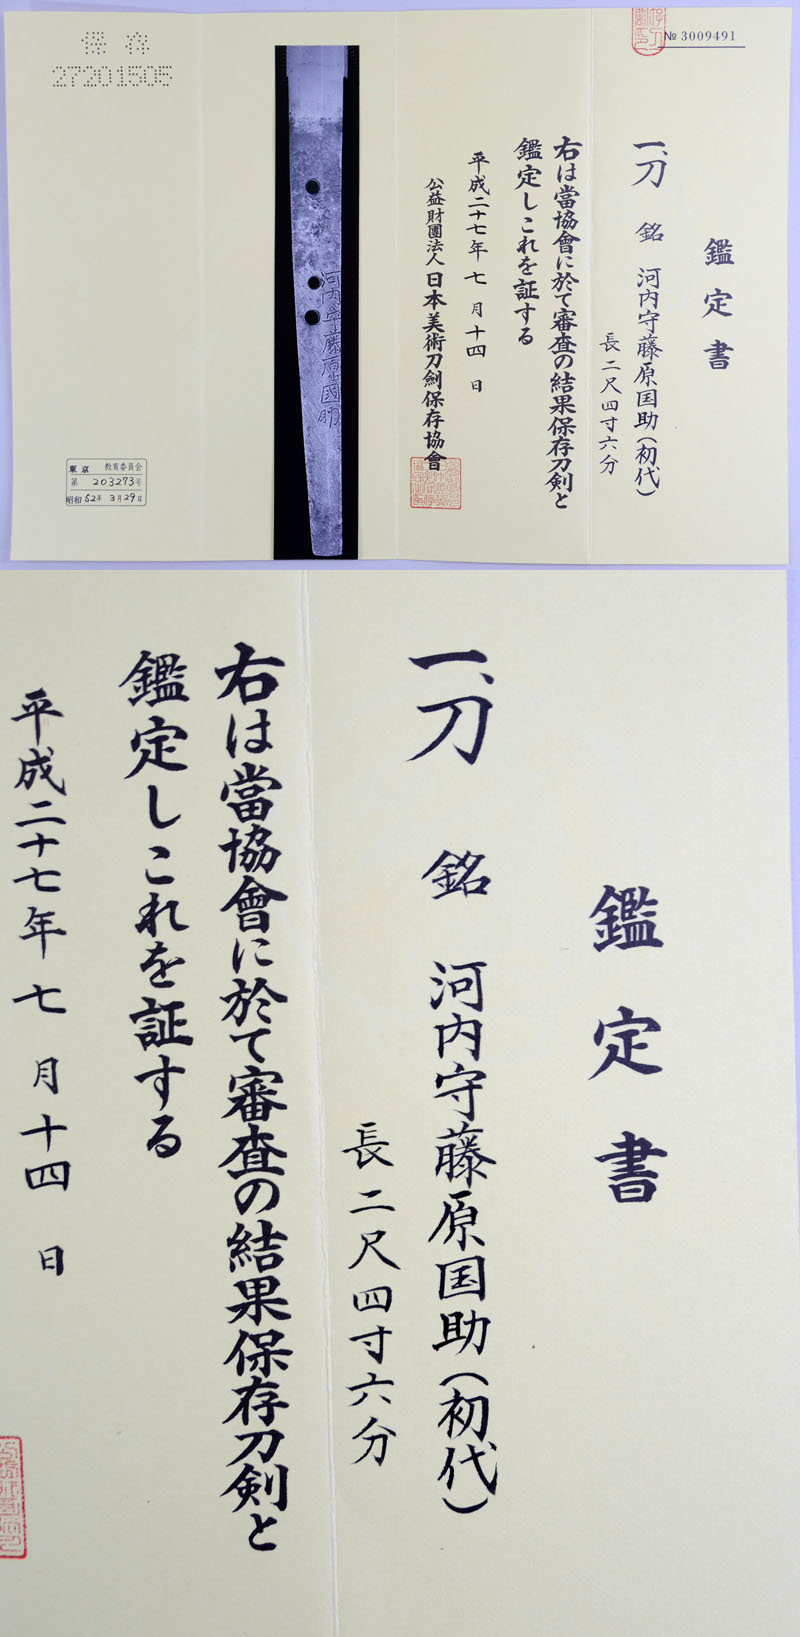 河内守藤原国助(初代) Picture of Certificate